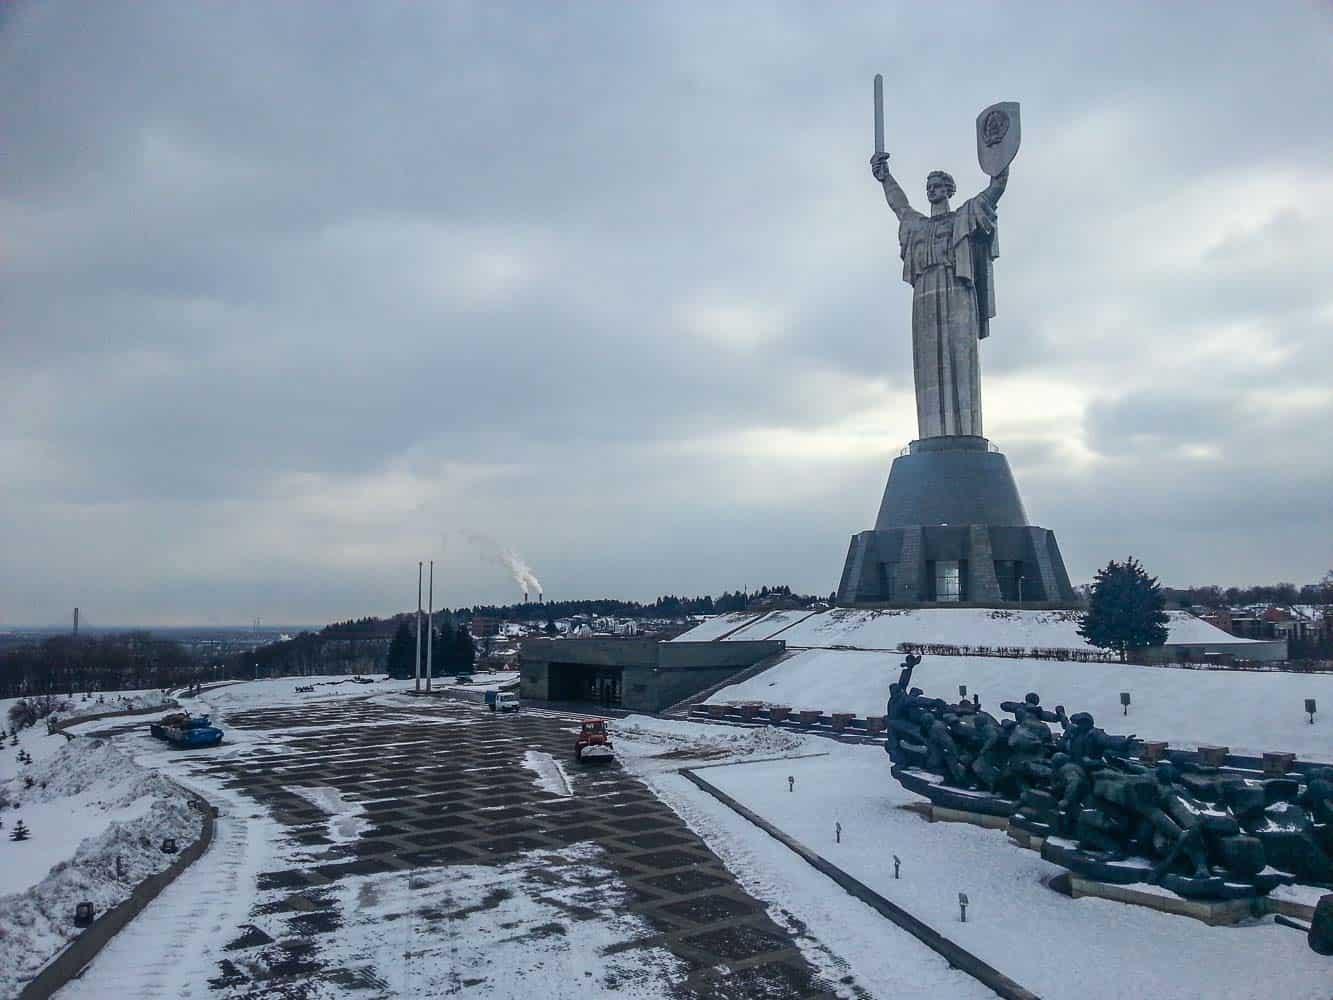 The motherland monument kiev ukraine